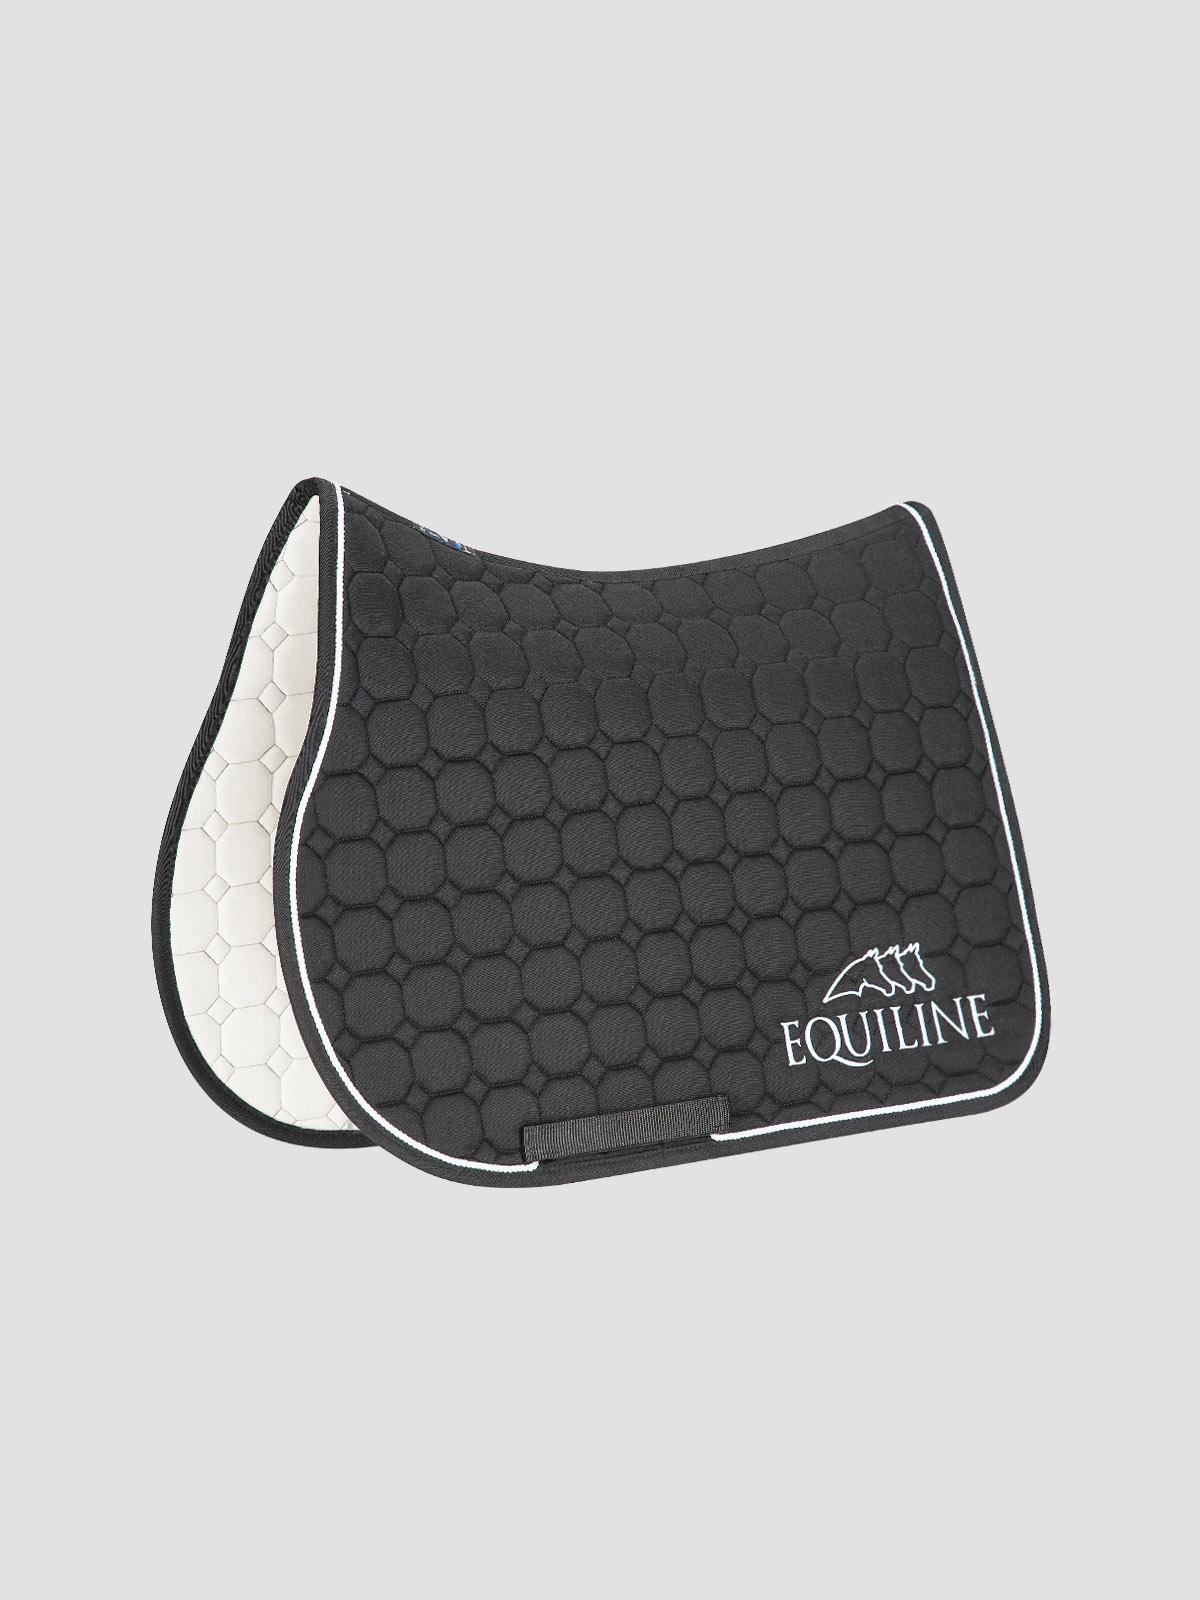 OUTLINE - Octagon Saddle Pad w/ Logo 3